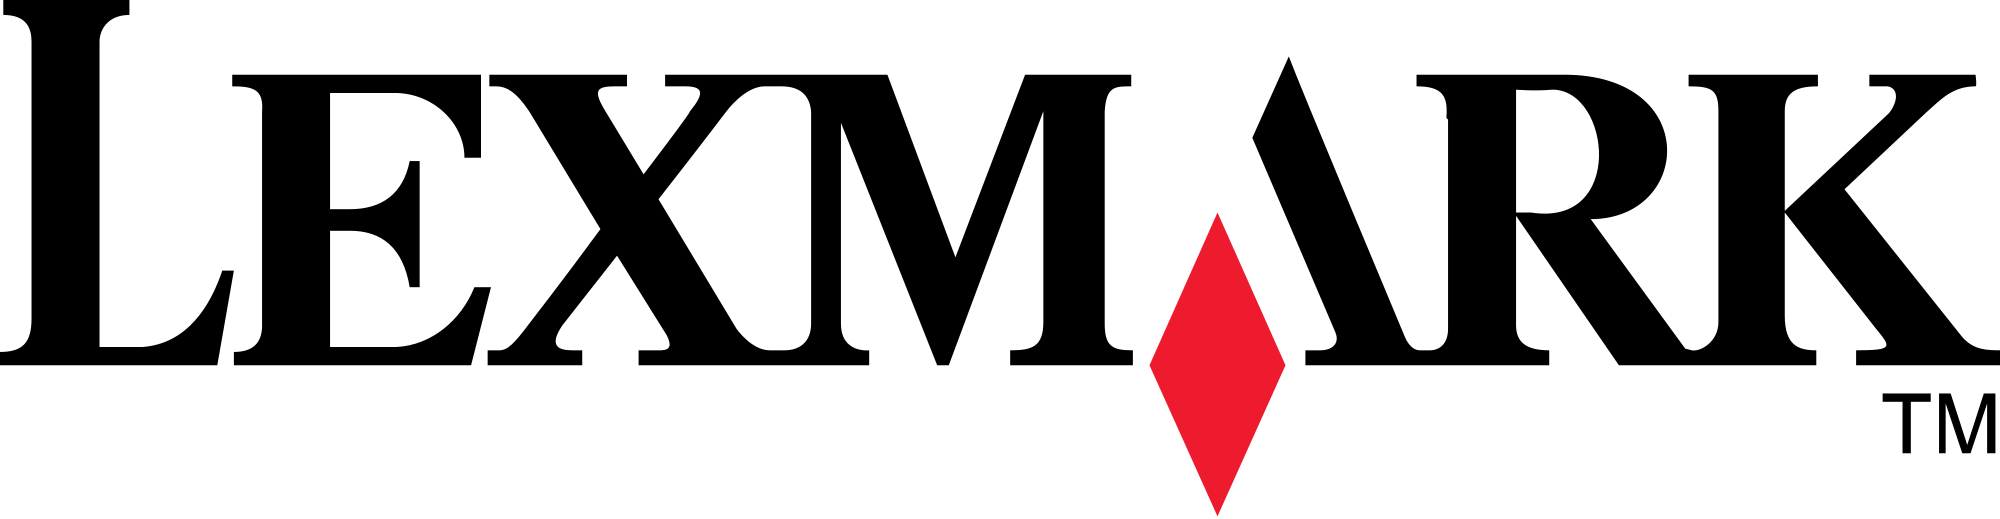 lexmark-png-lexmark-konya-yetkili-teknik-servisi-2000.png